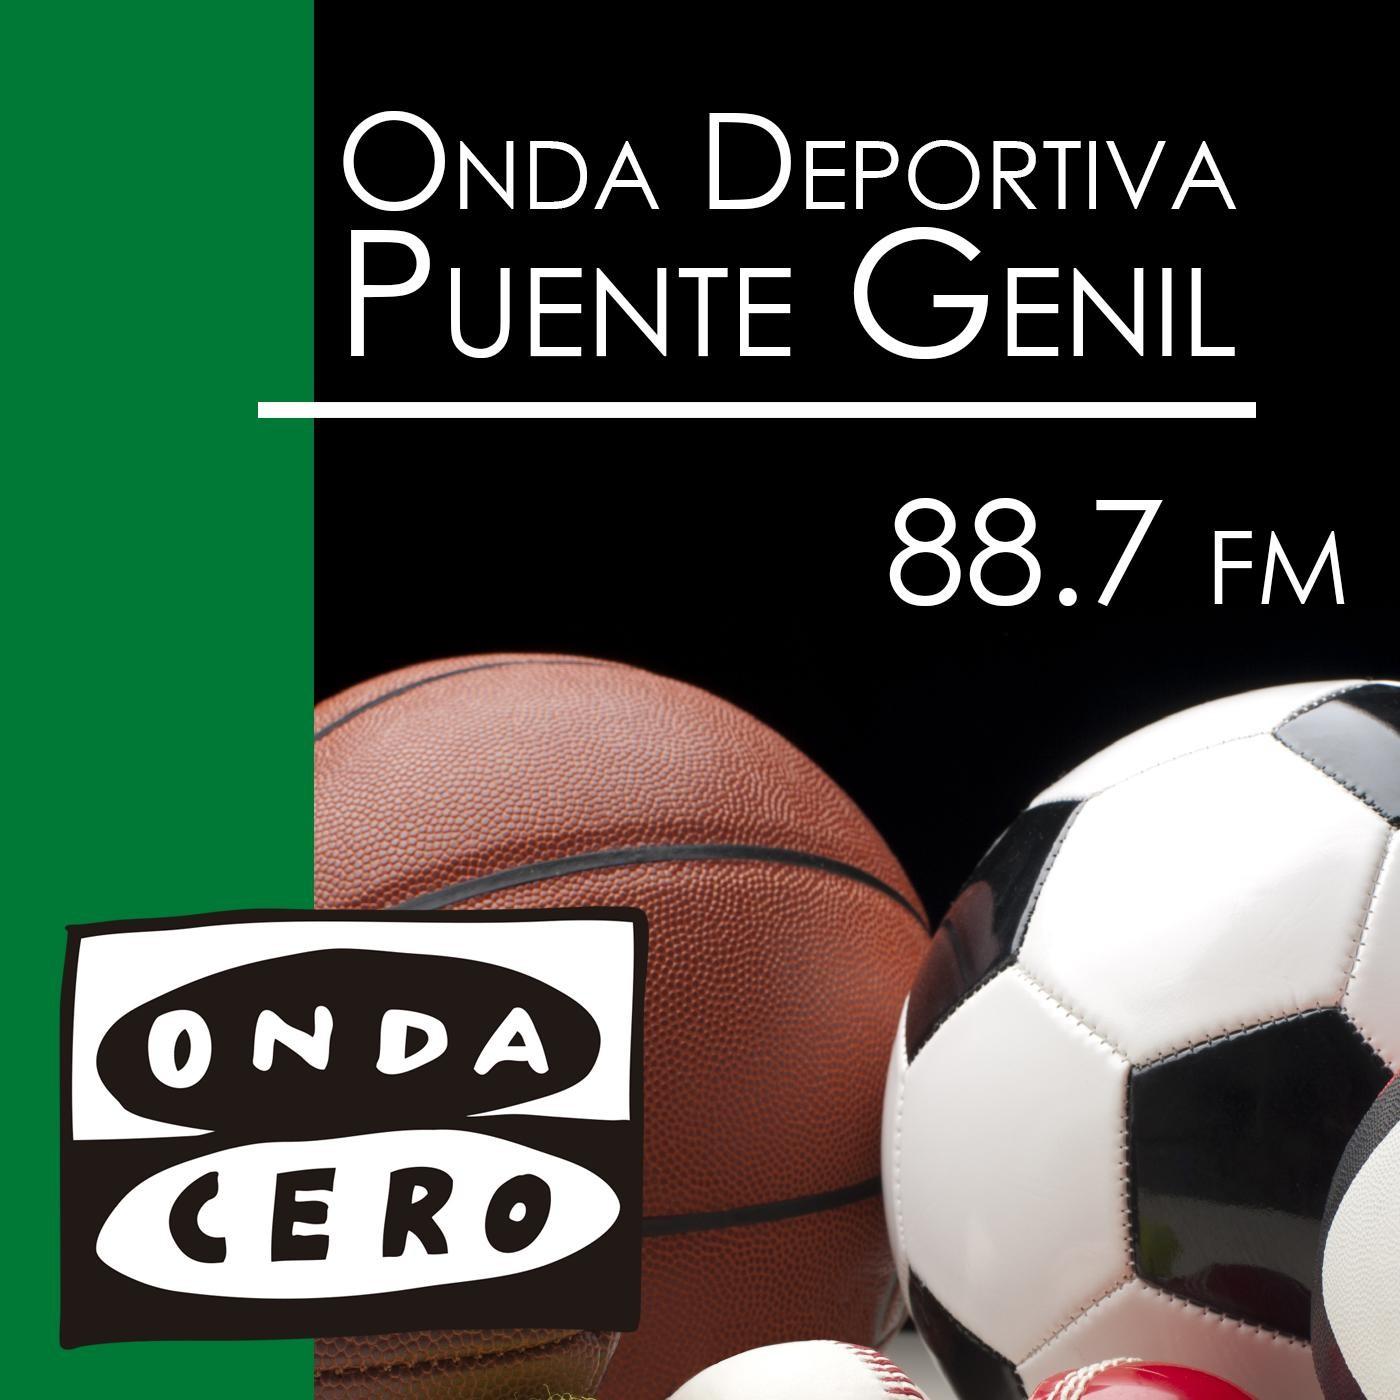 <![CDATA[Onda Deportiva Puente Genil]]>